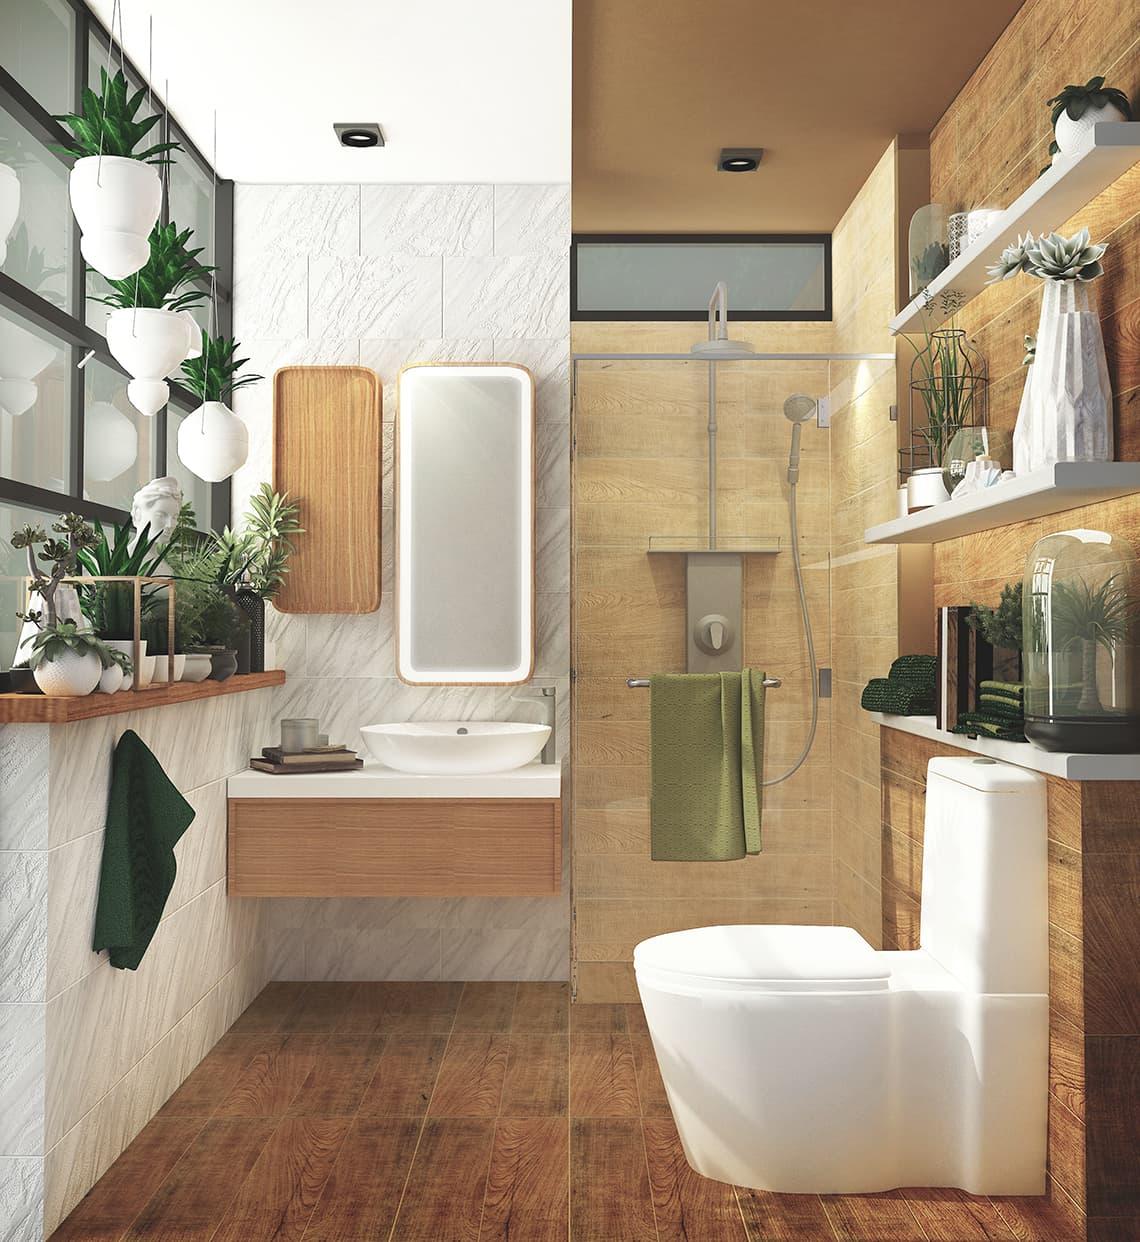 Small bathroom decorate CRAFTSMAN